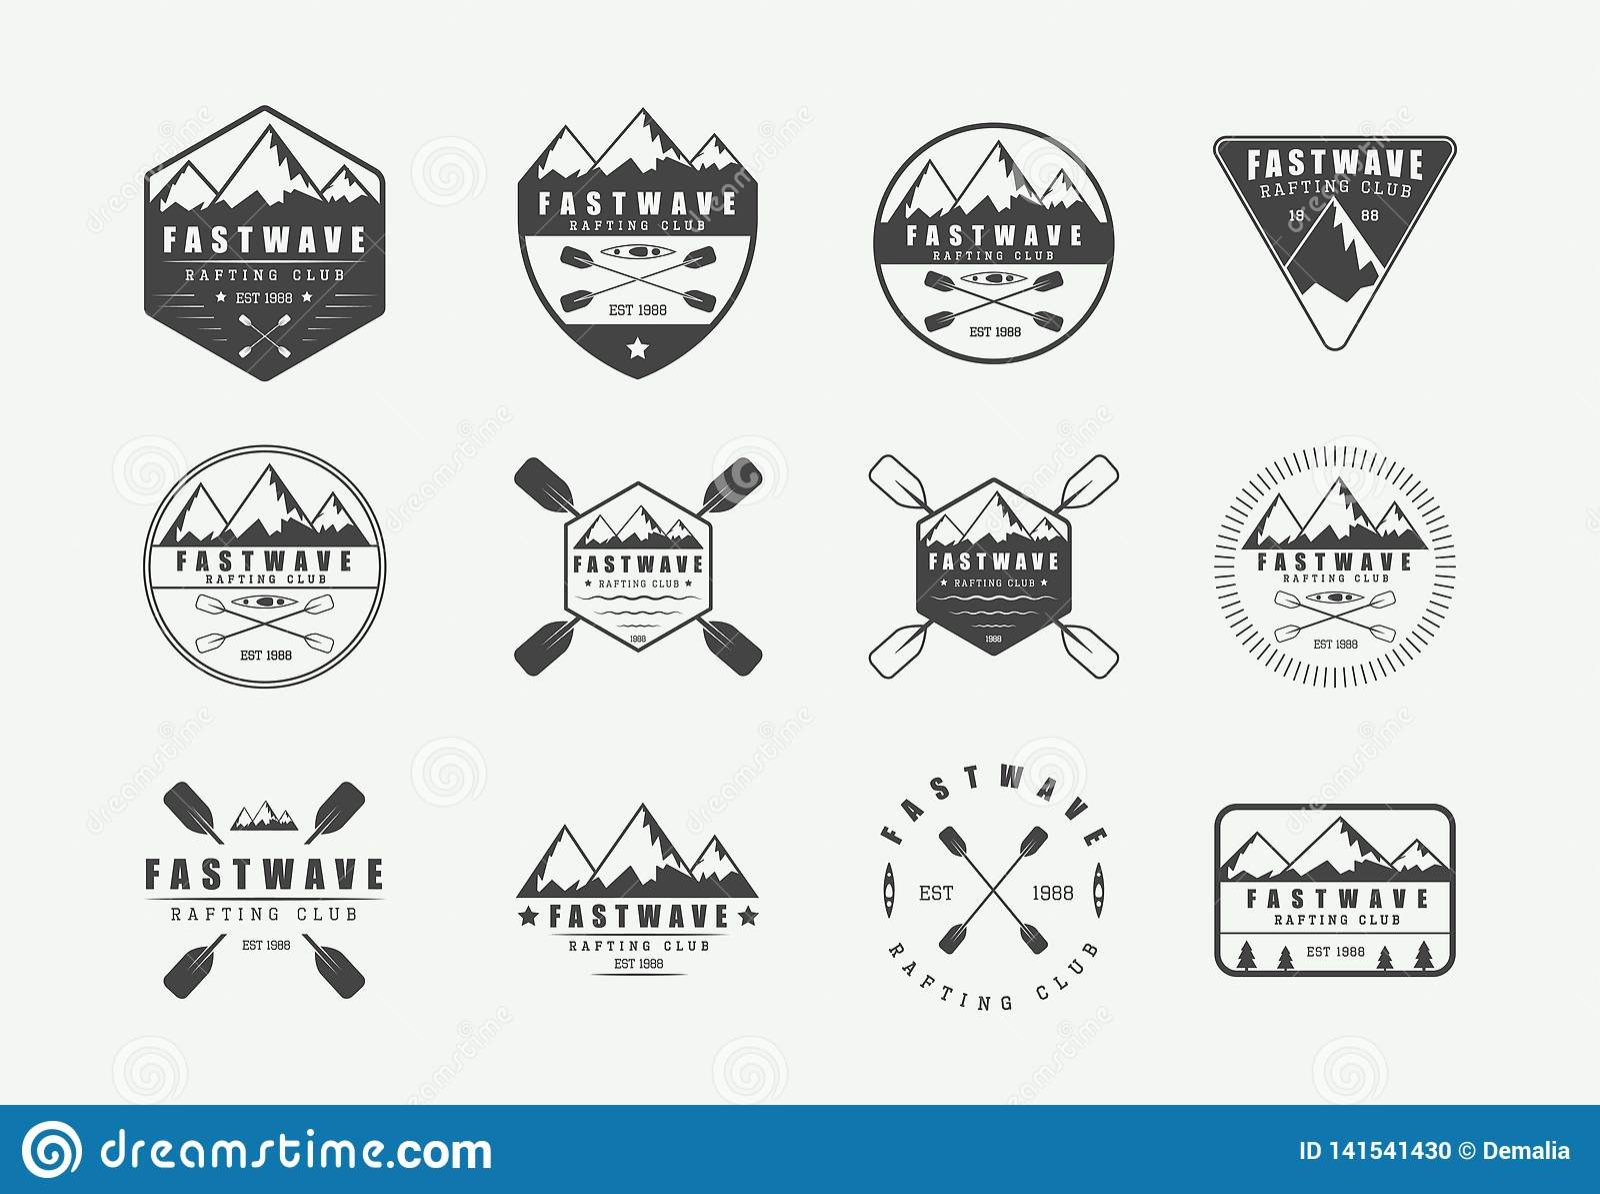 Set of vintage rafting logo, labels and badges. Graphic Art.